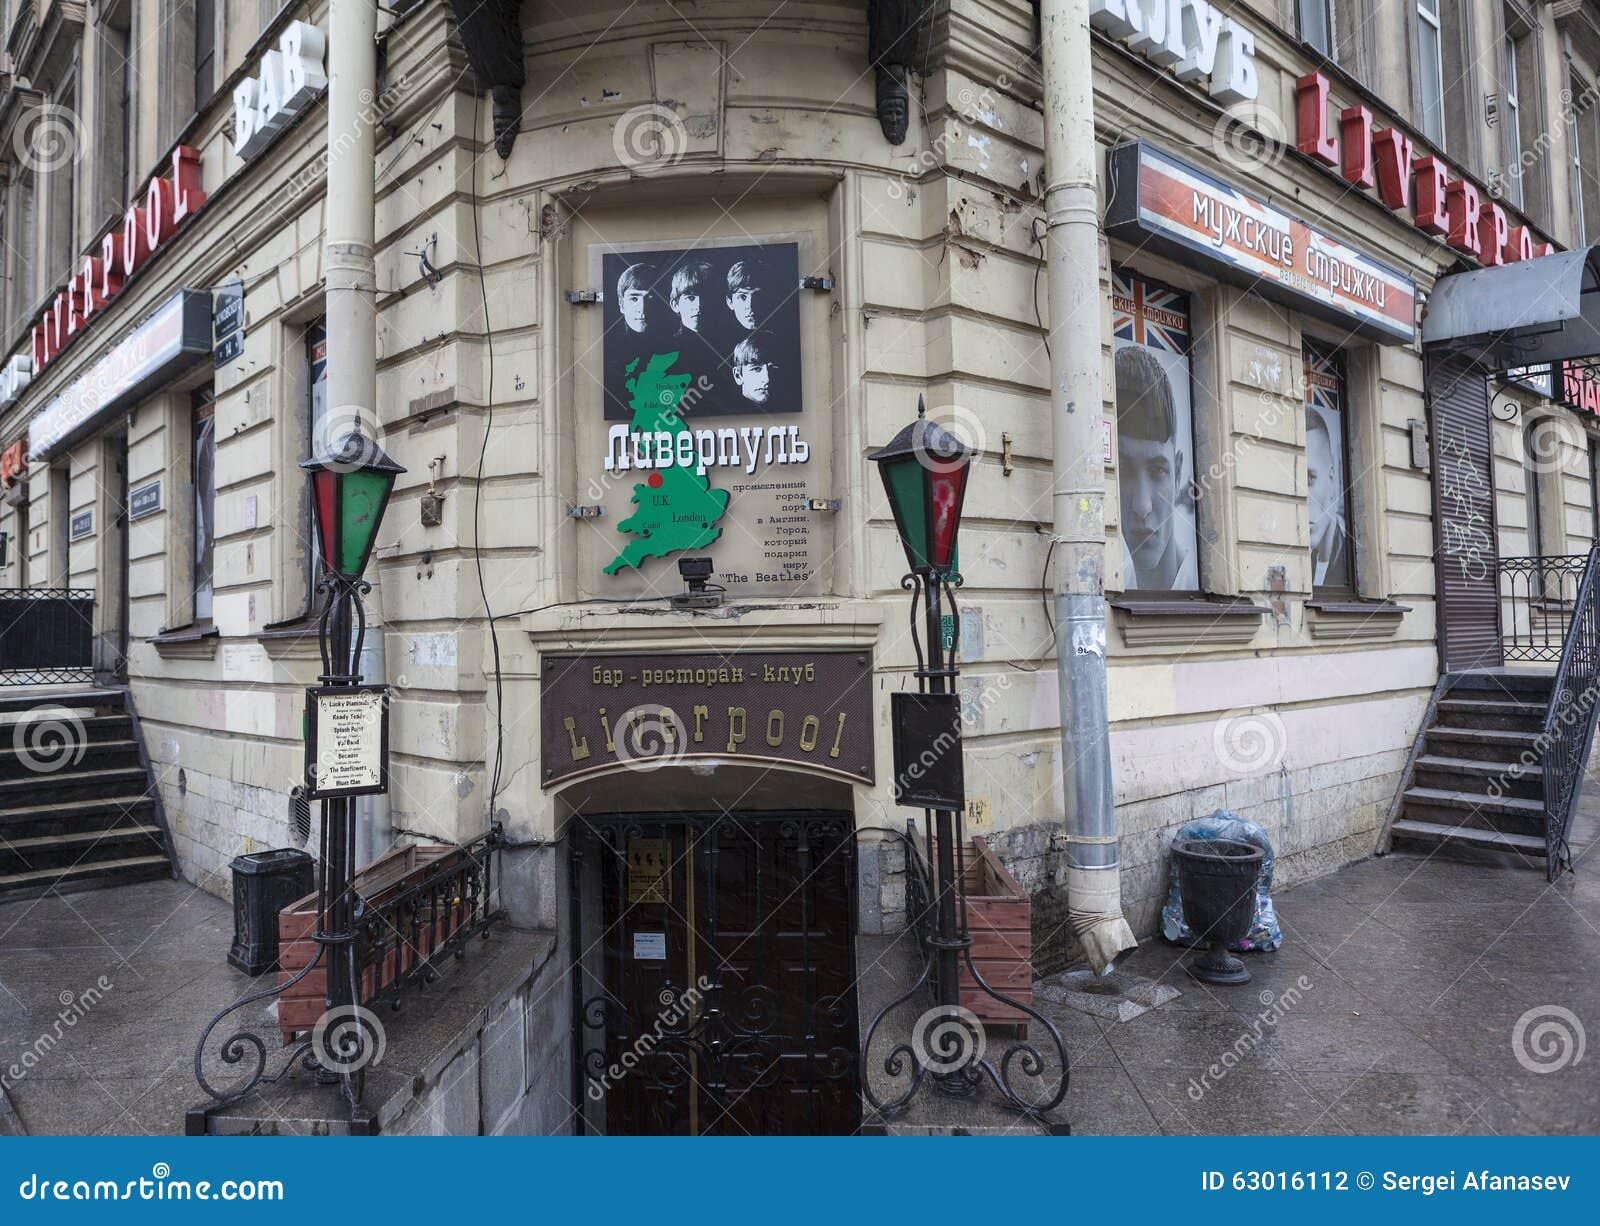 St. Petersburg Russian Restaurant & Dining Club | 7A York Street, Liverpool L1 5BN | +44 151 709 6676